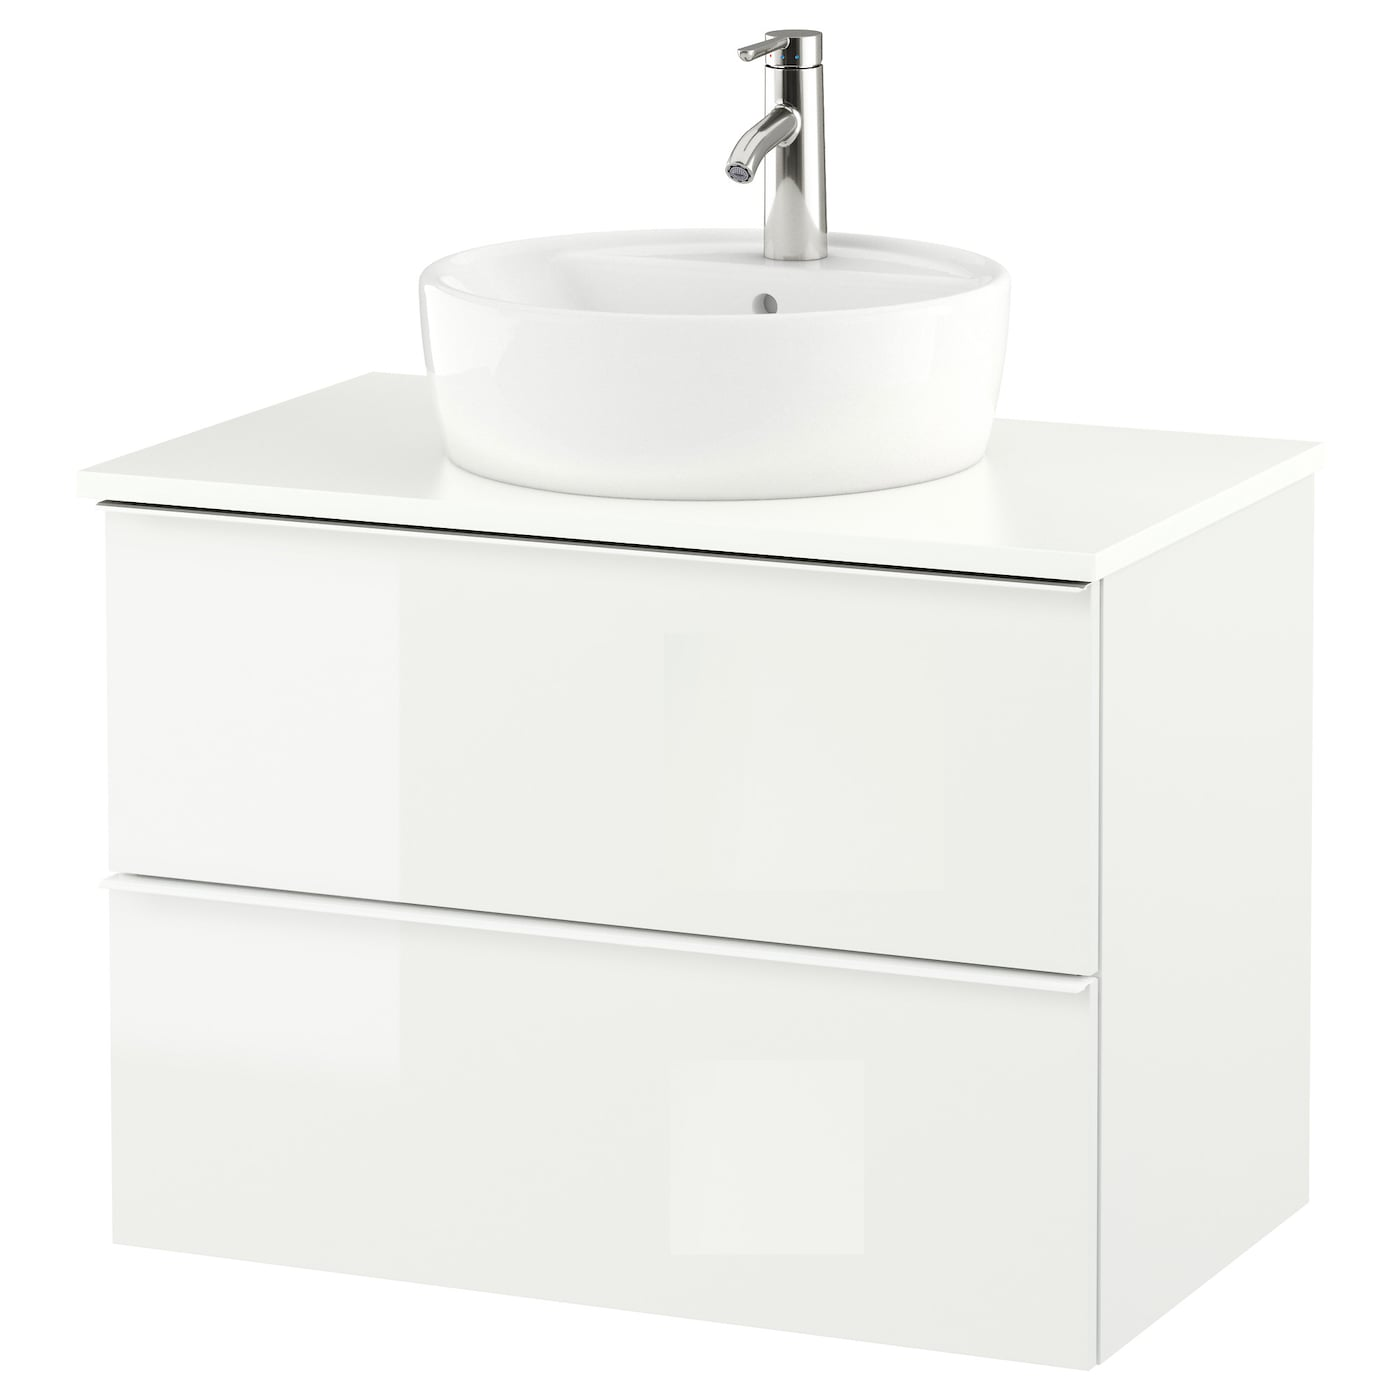 White gloss bathroom unit - Ikea Godmorgon Tolken T Rnviken Wsh Stnd W Countertop 45 Wsh Basin